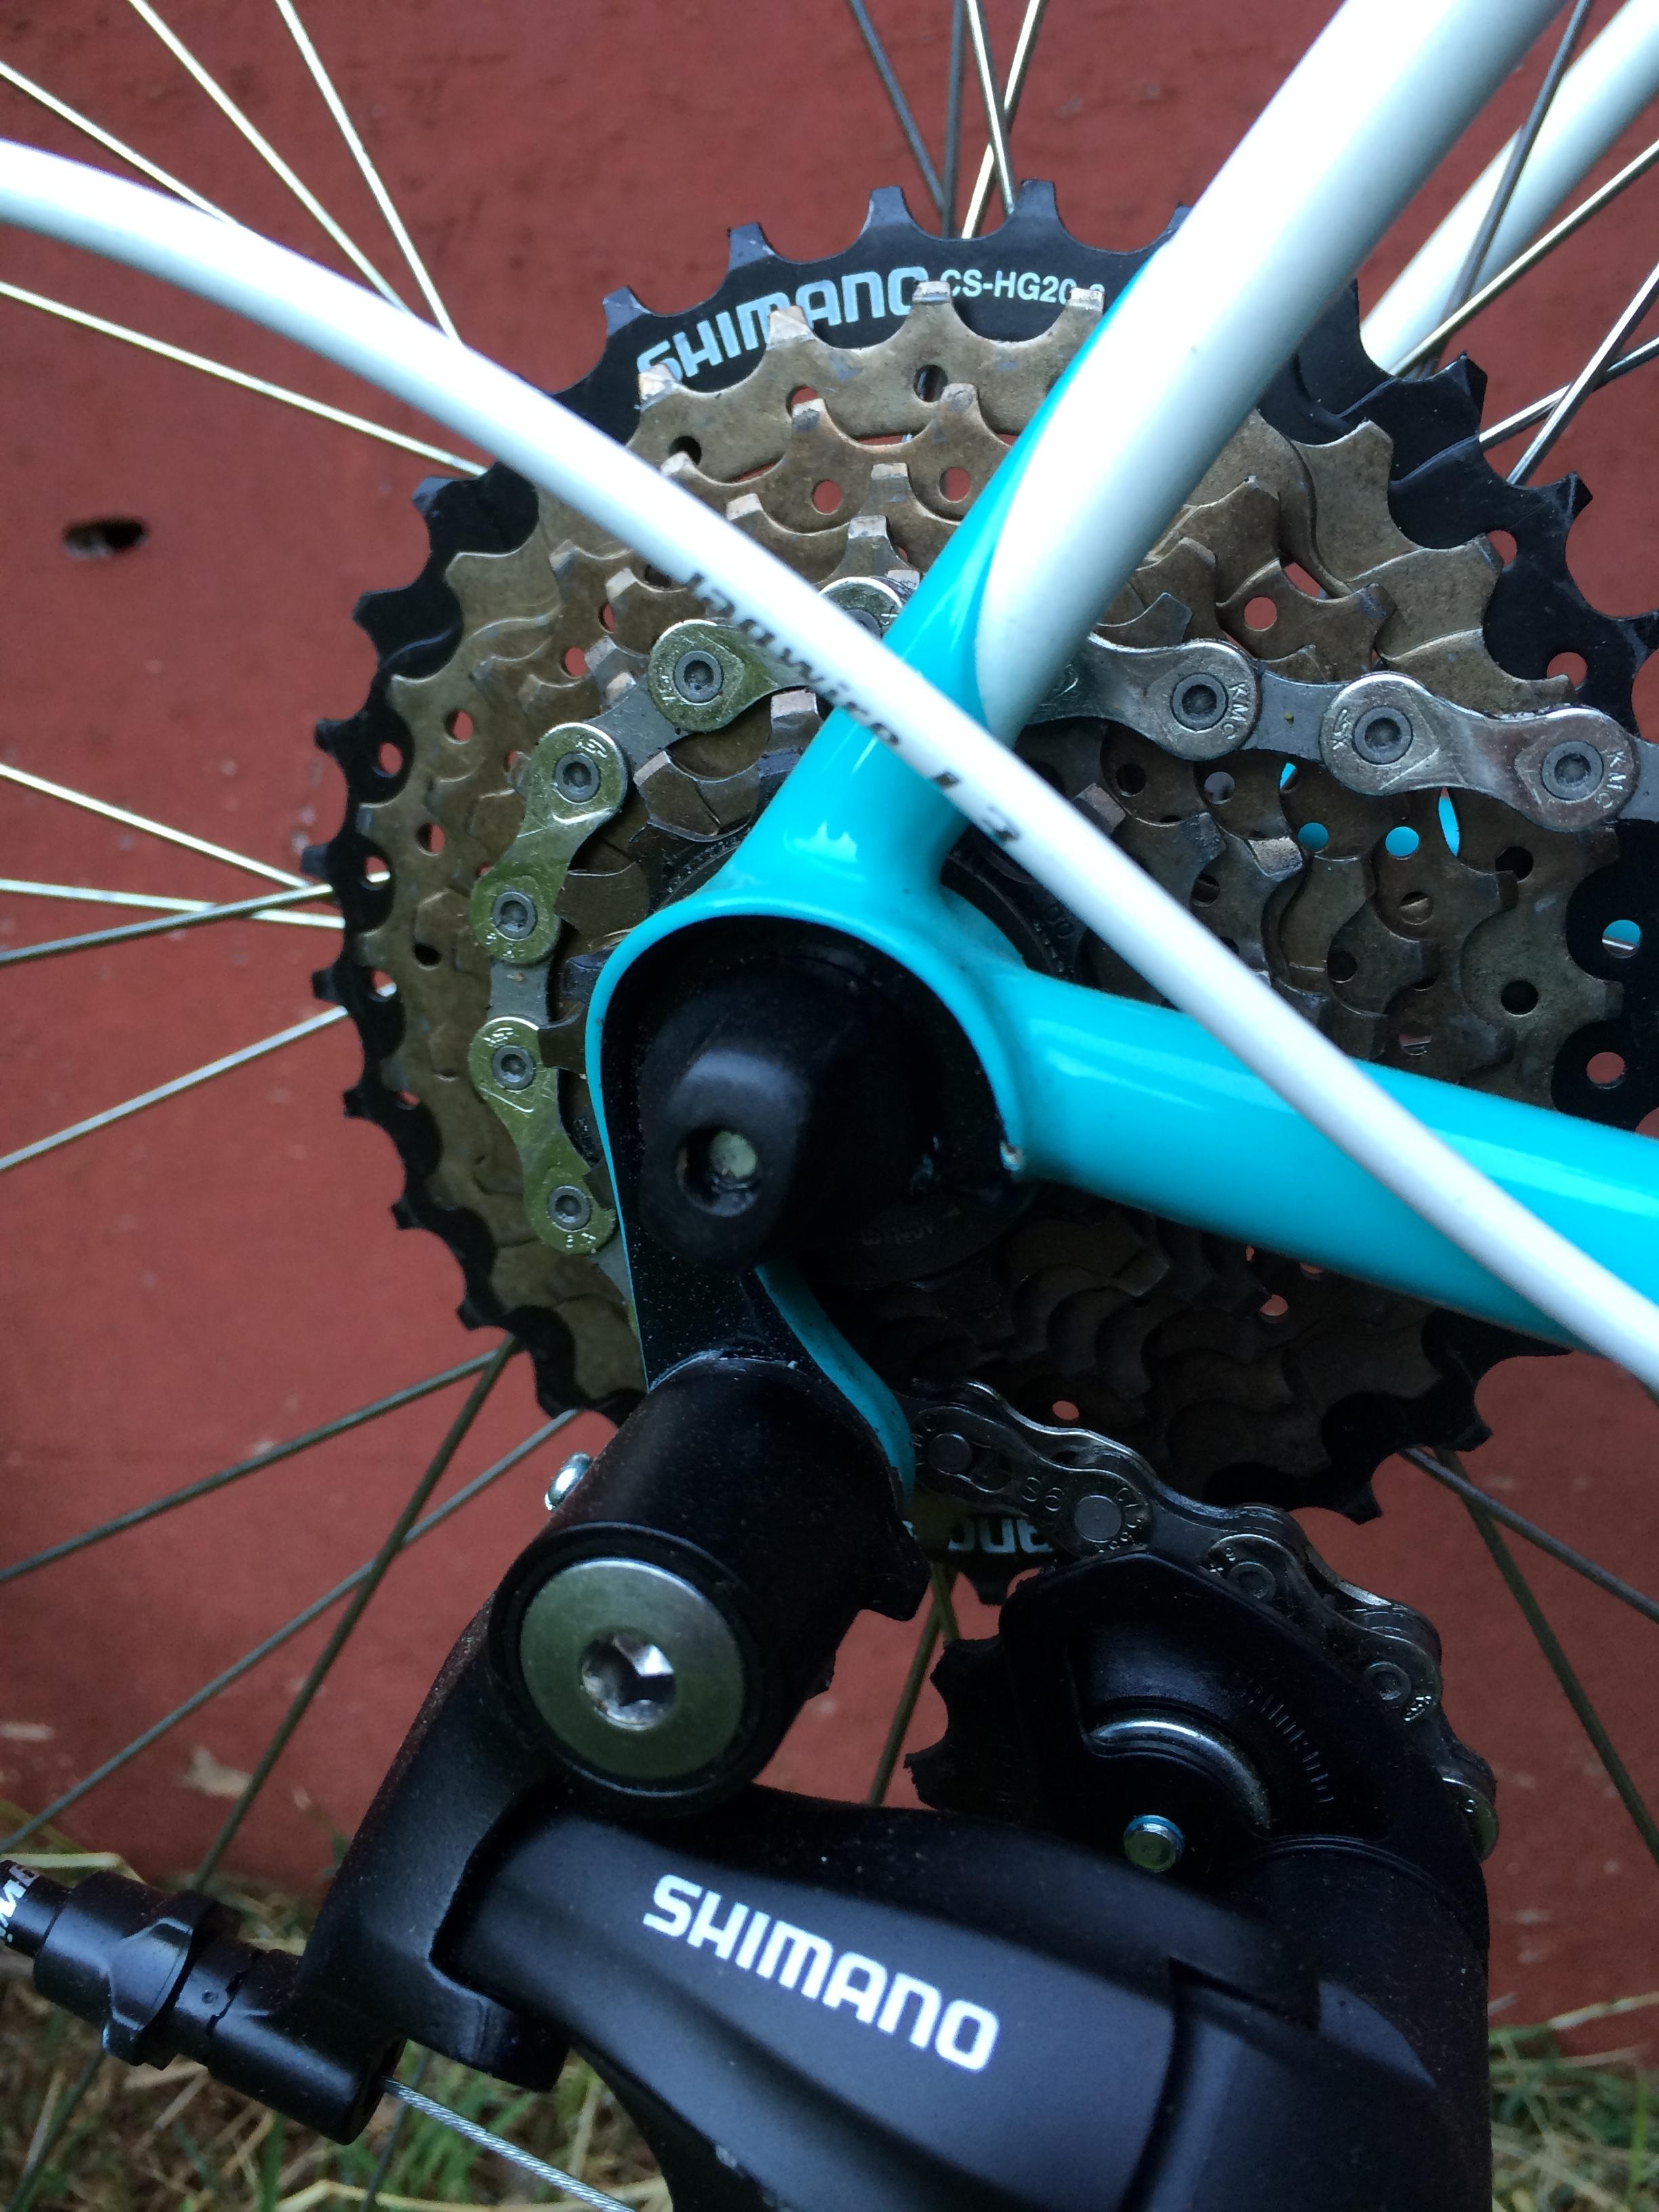 Dogwood-cycleworx-steel-custom-bicycle-columbus-tubing-cyclo-cross-6.jpg